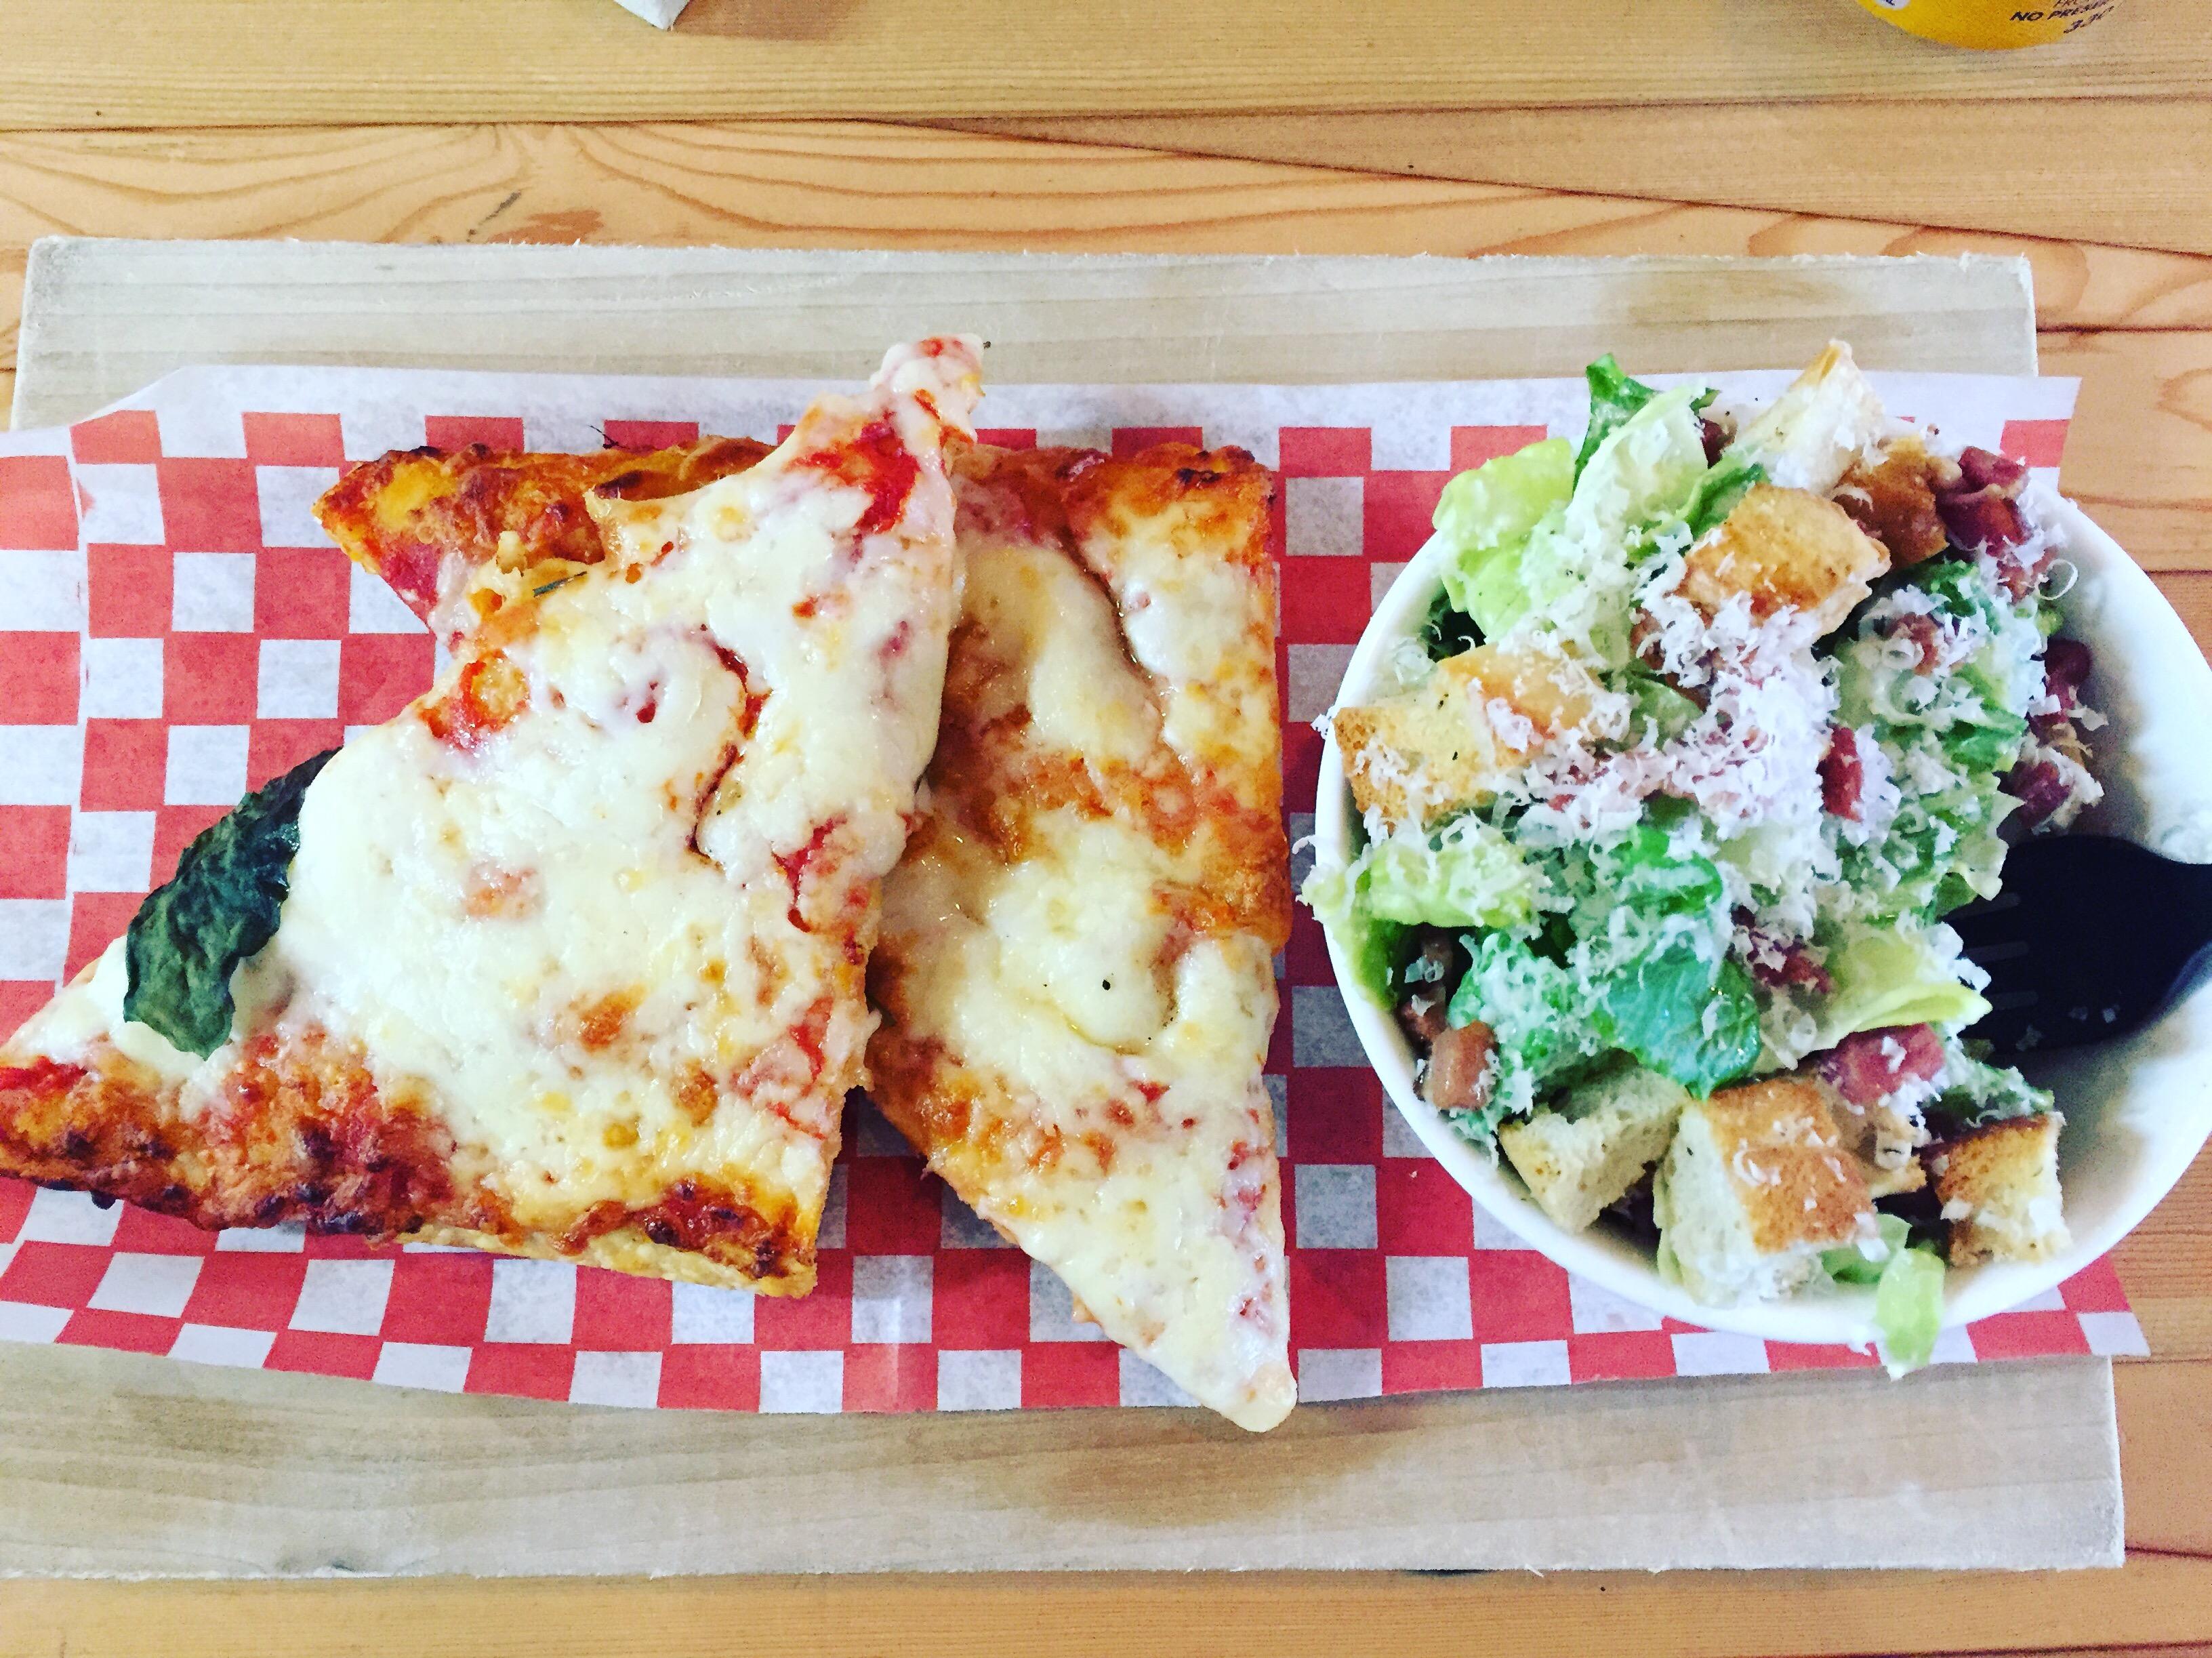 Latest Vancouver Eats: Mister, Zero Zero Pizzeria, Poké Time